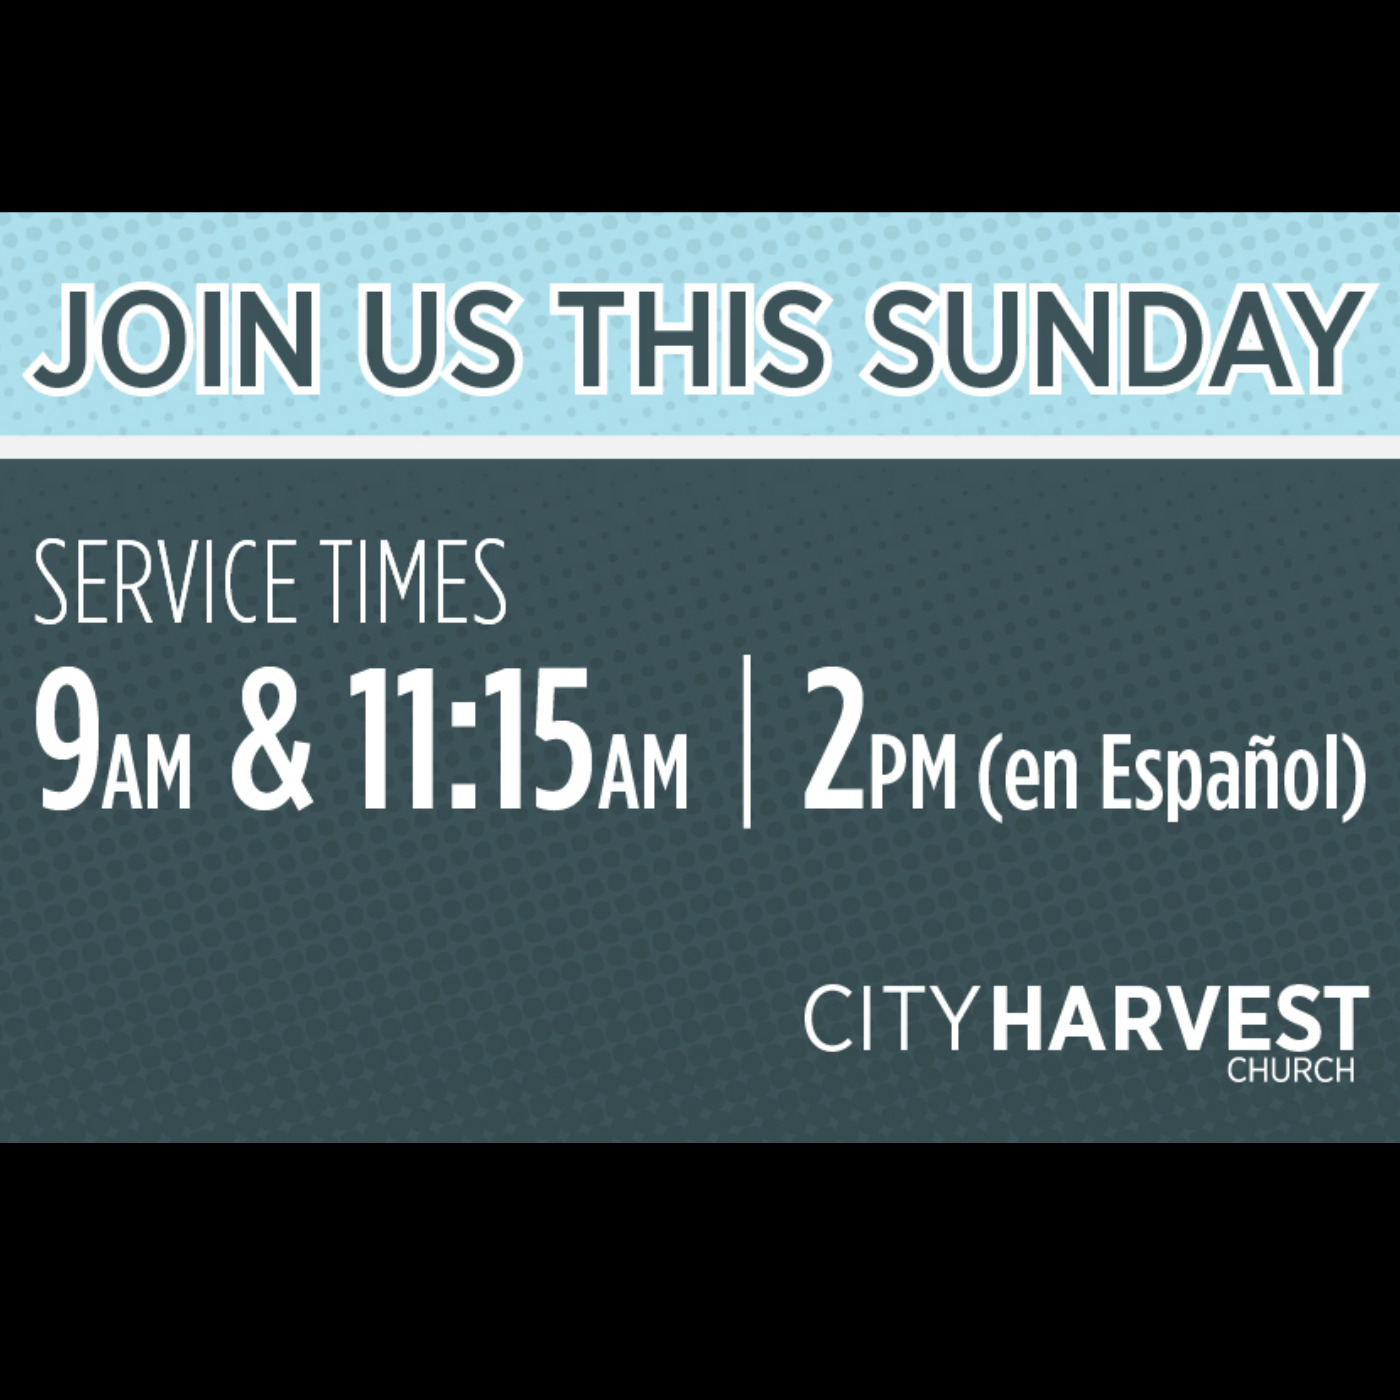 City Harvest Church